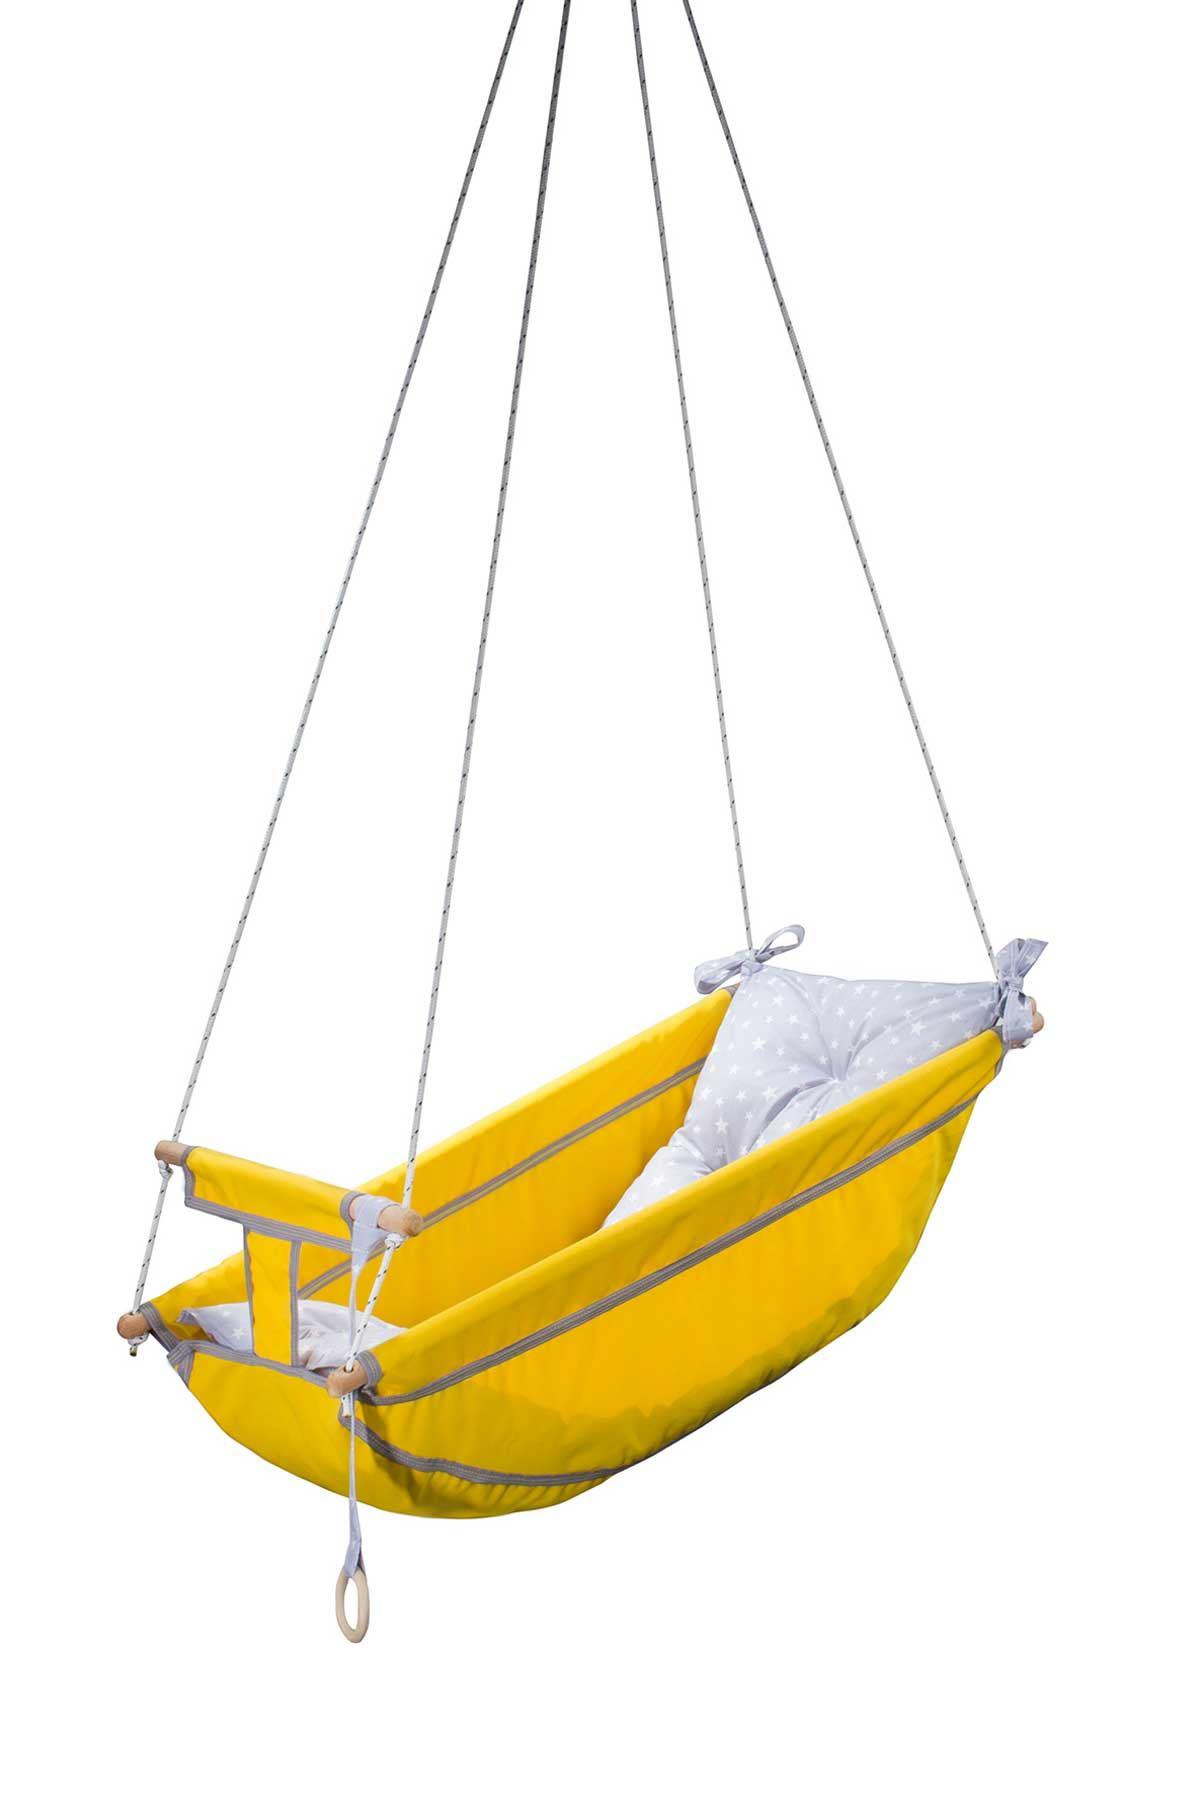 Yellow Bundera Kids Baby Sleeping Swing Wooden Hammock Cradle Swing